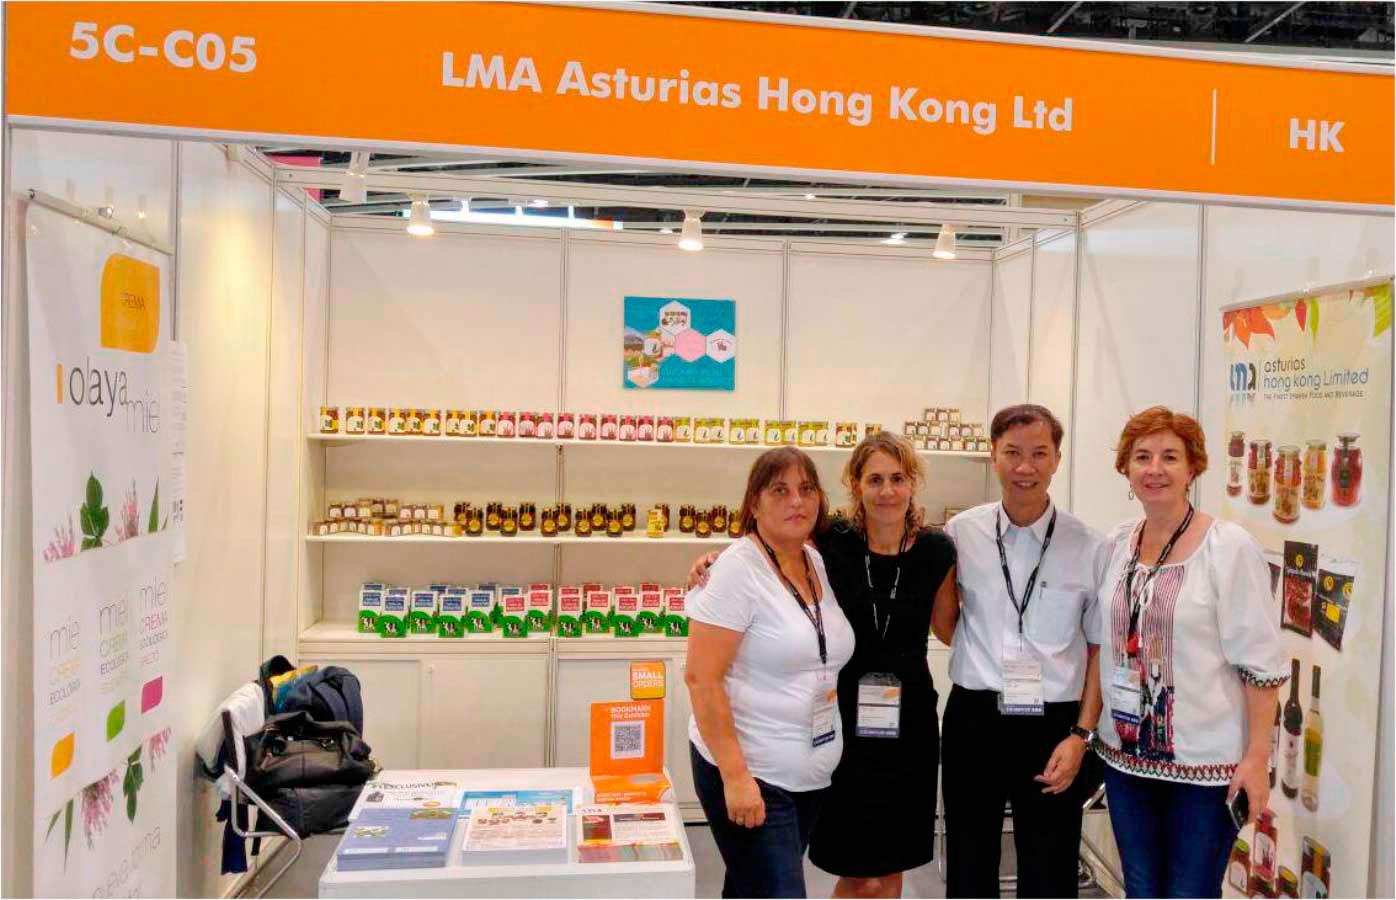 lma asturias hong kong - exportación de productos asturianos en china